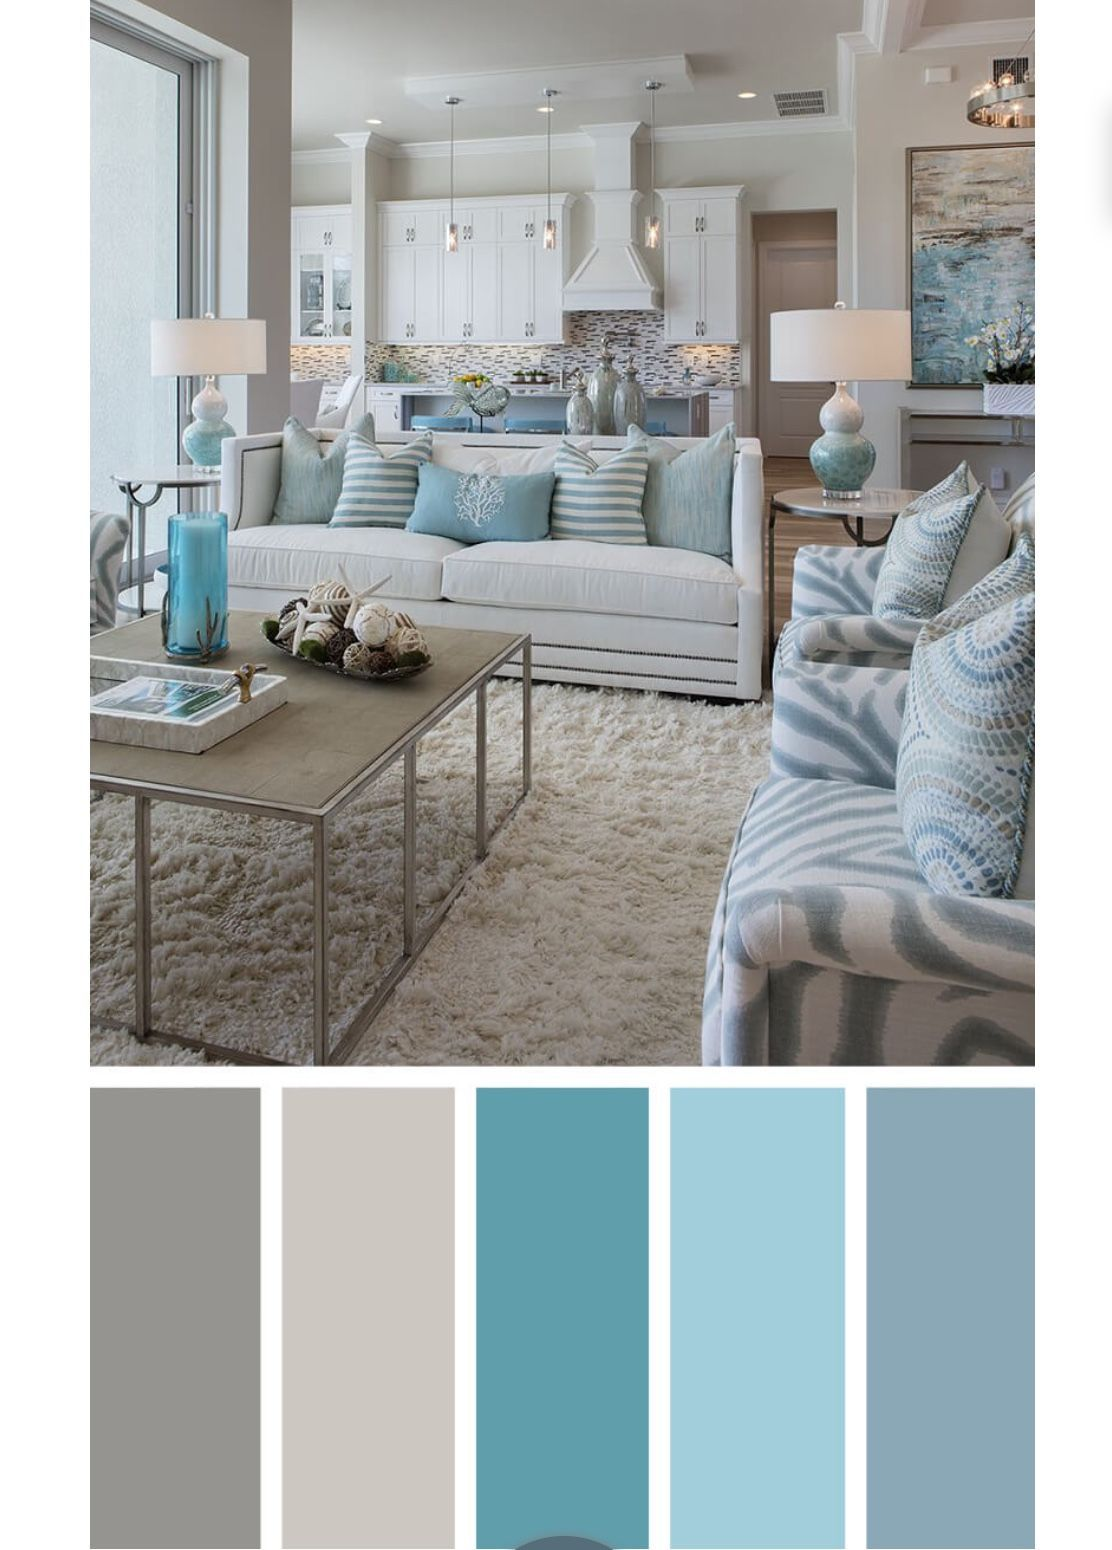 Colour Scheme Kitchen Dining Living Room Color Schemes Living Room Color Dining Room Colors Great living room colors